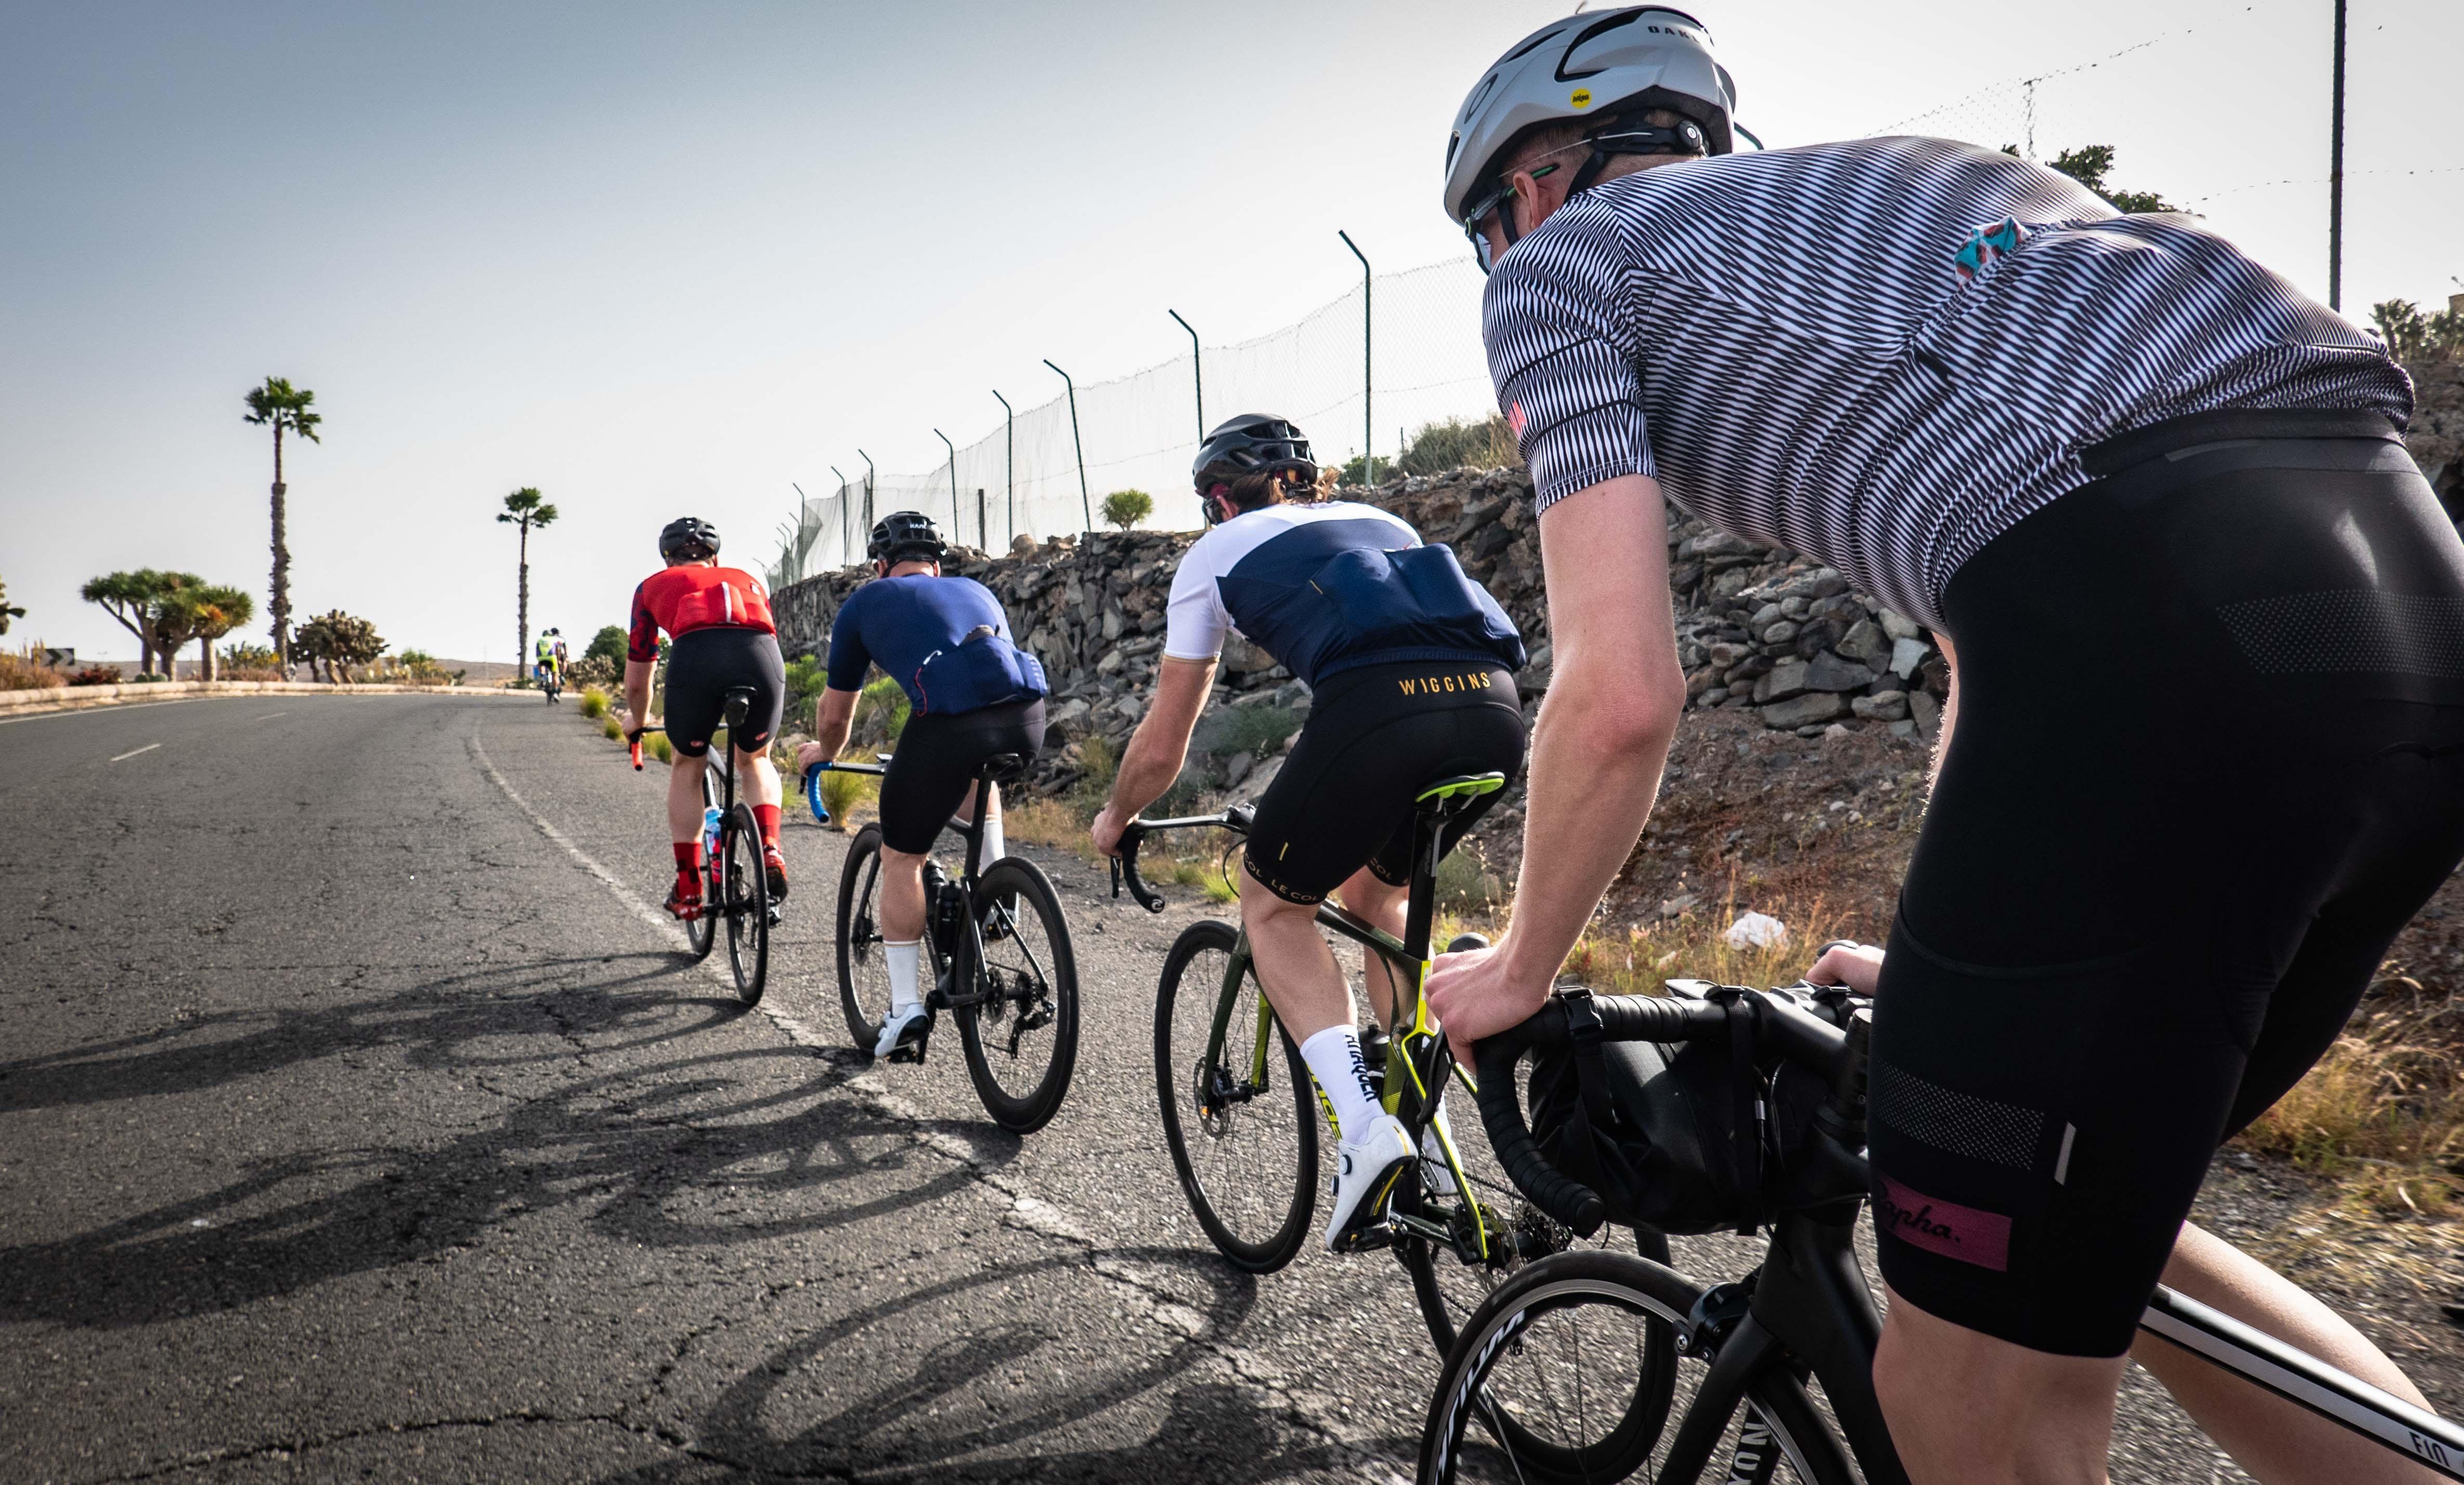 four man riding bicycle on road during daytime